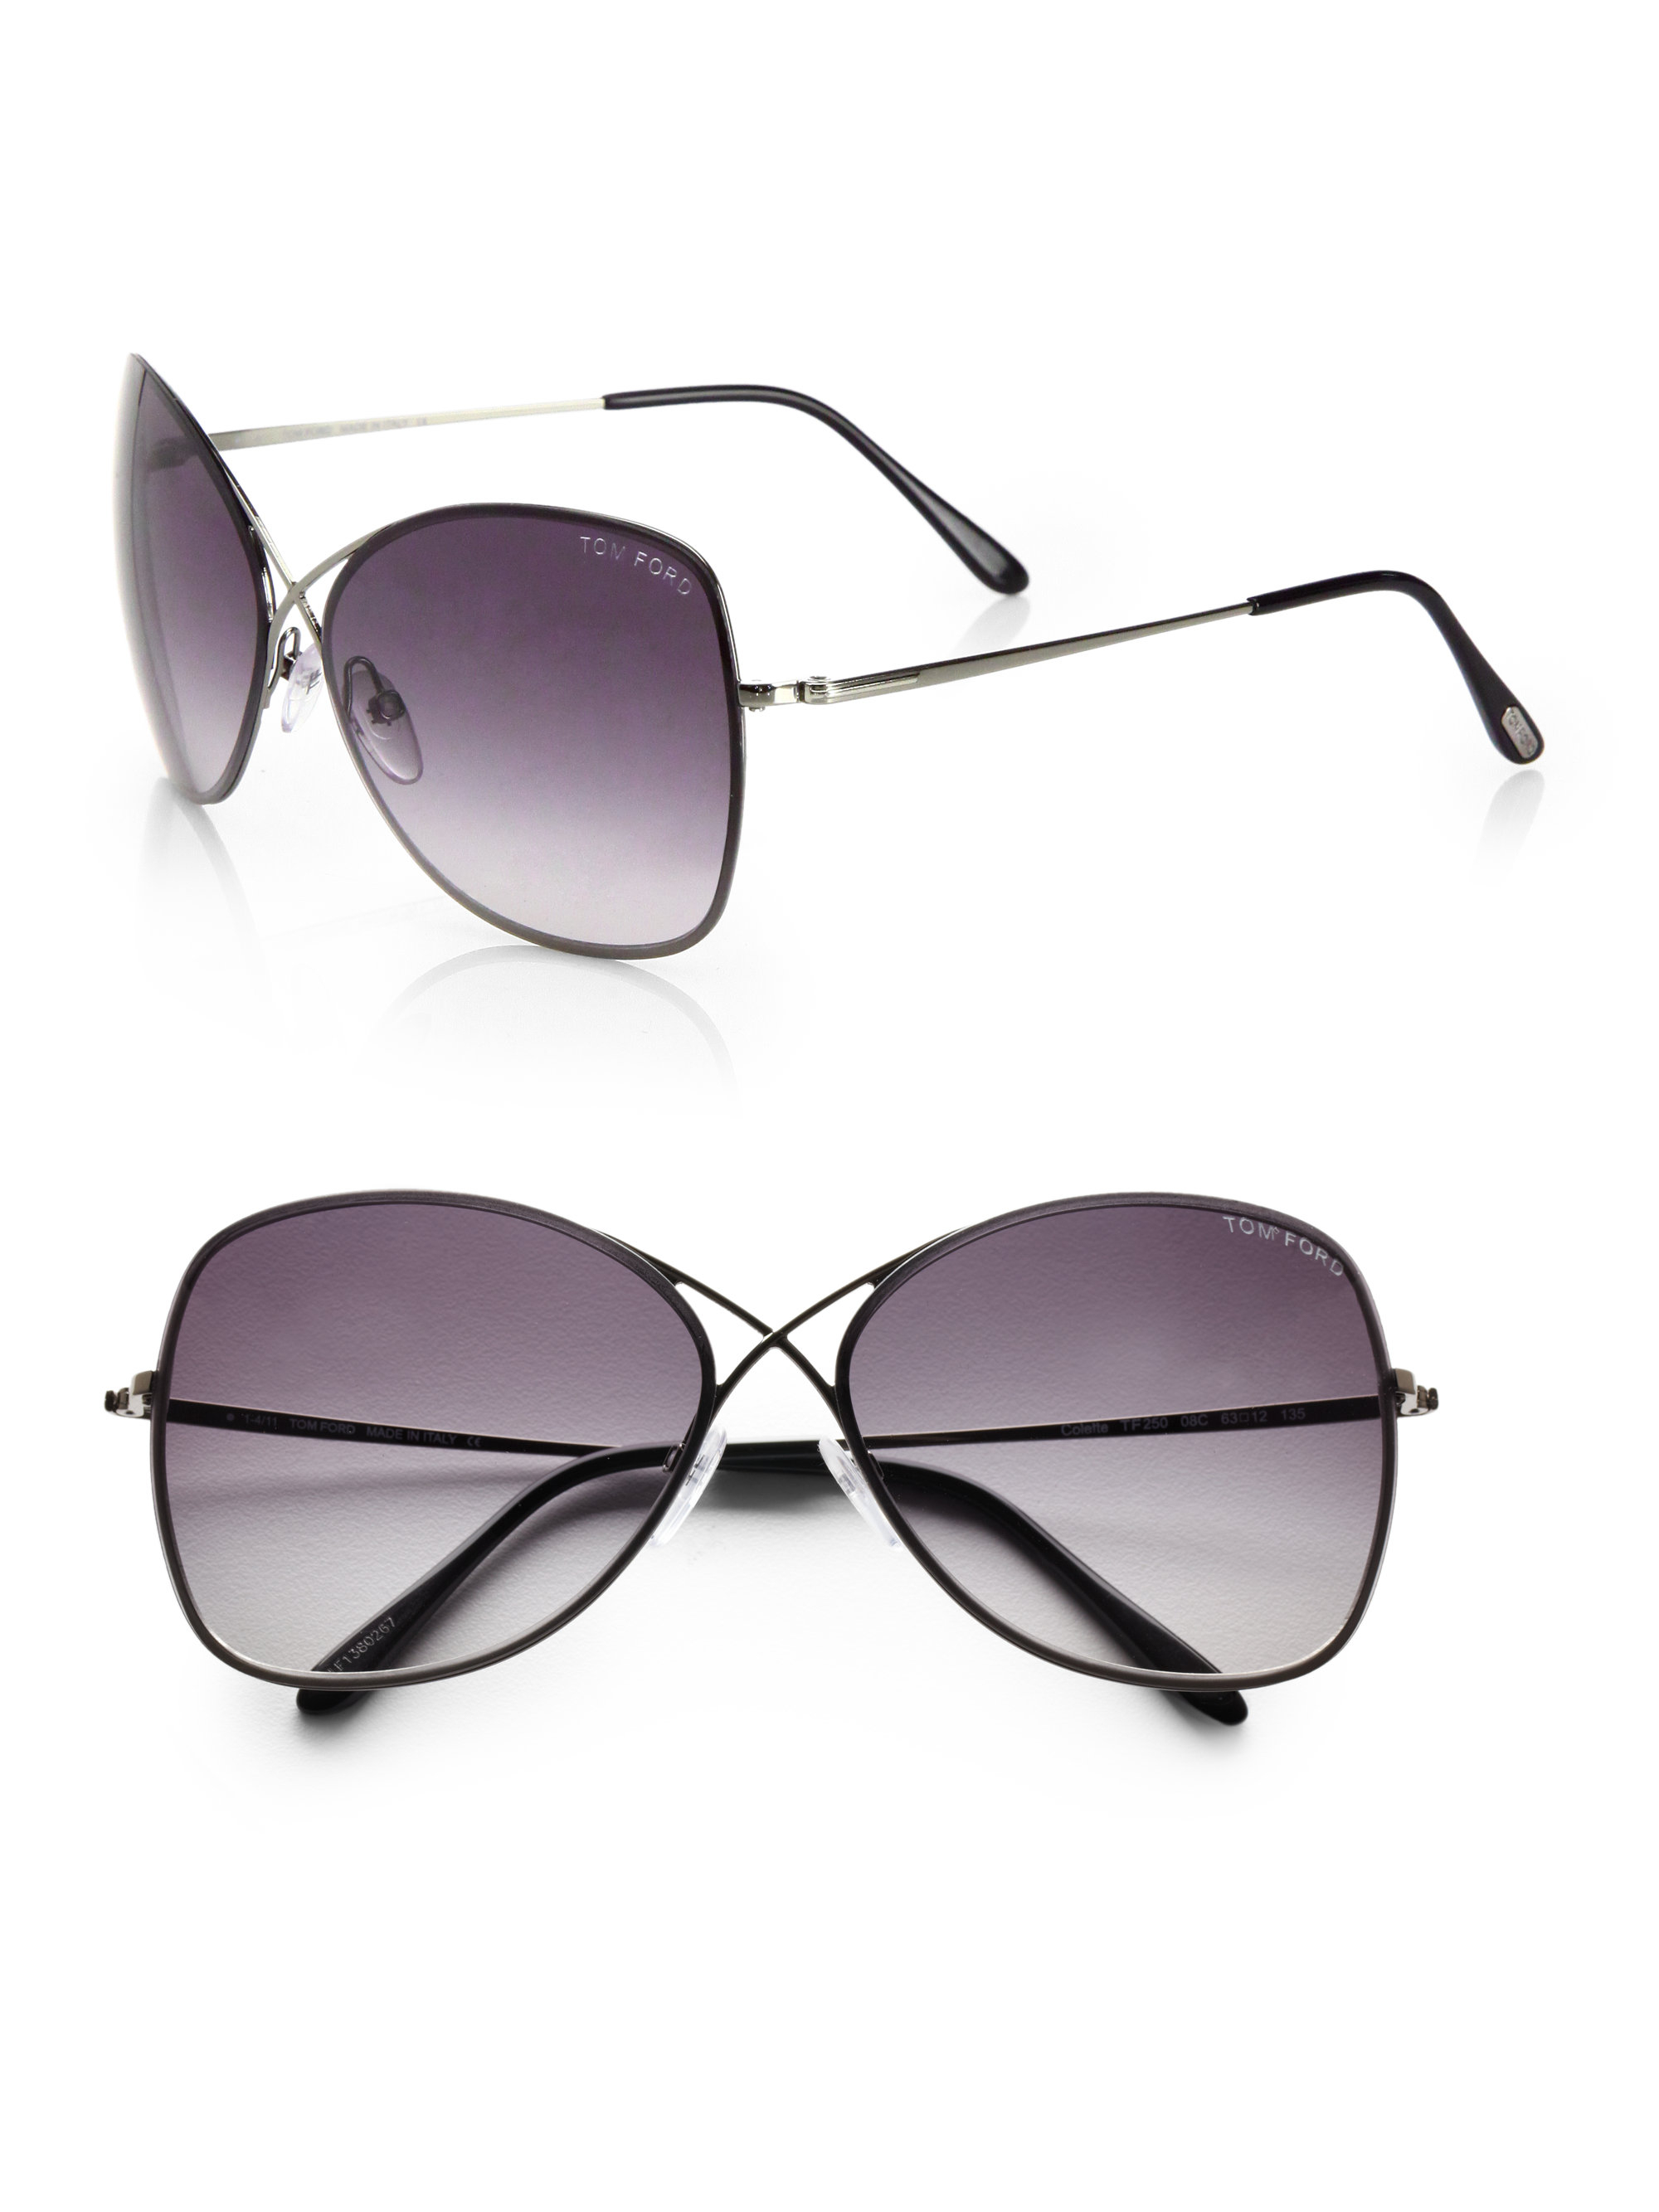 Rimless Aviator Sunglasses : Tom Ford Colette Rimless Oversized Aviator Sunglasses in ...